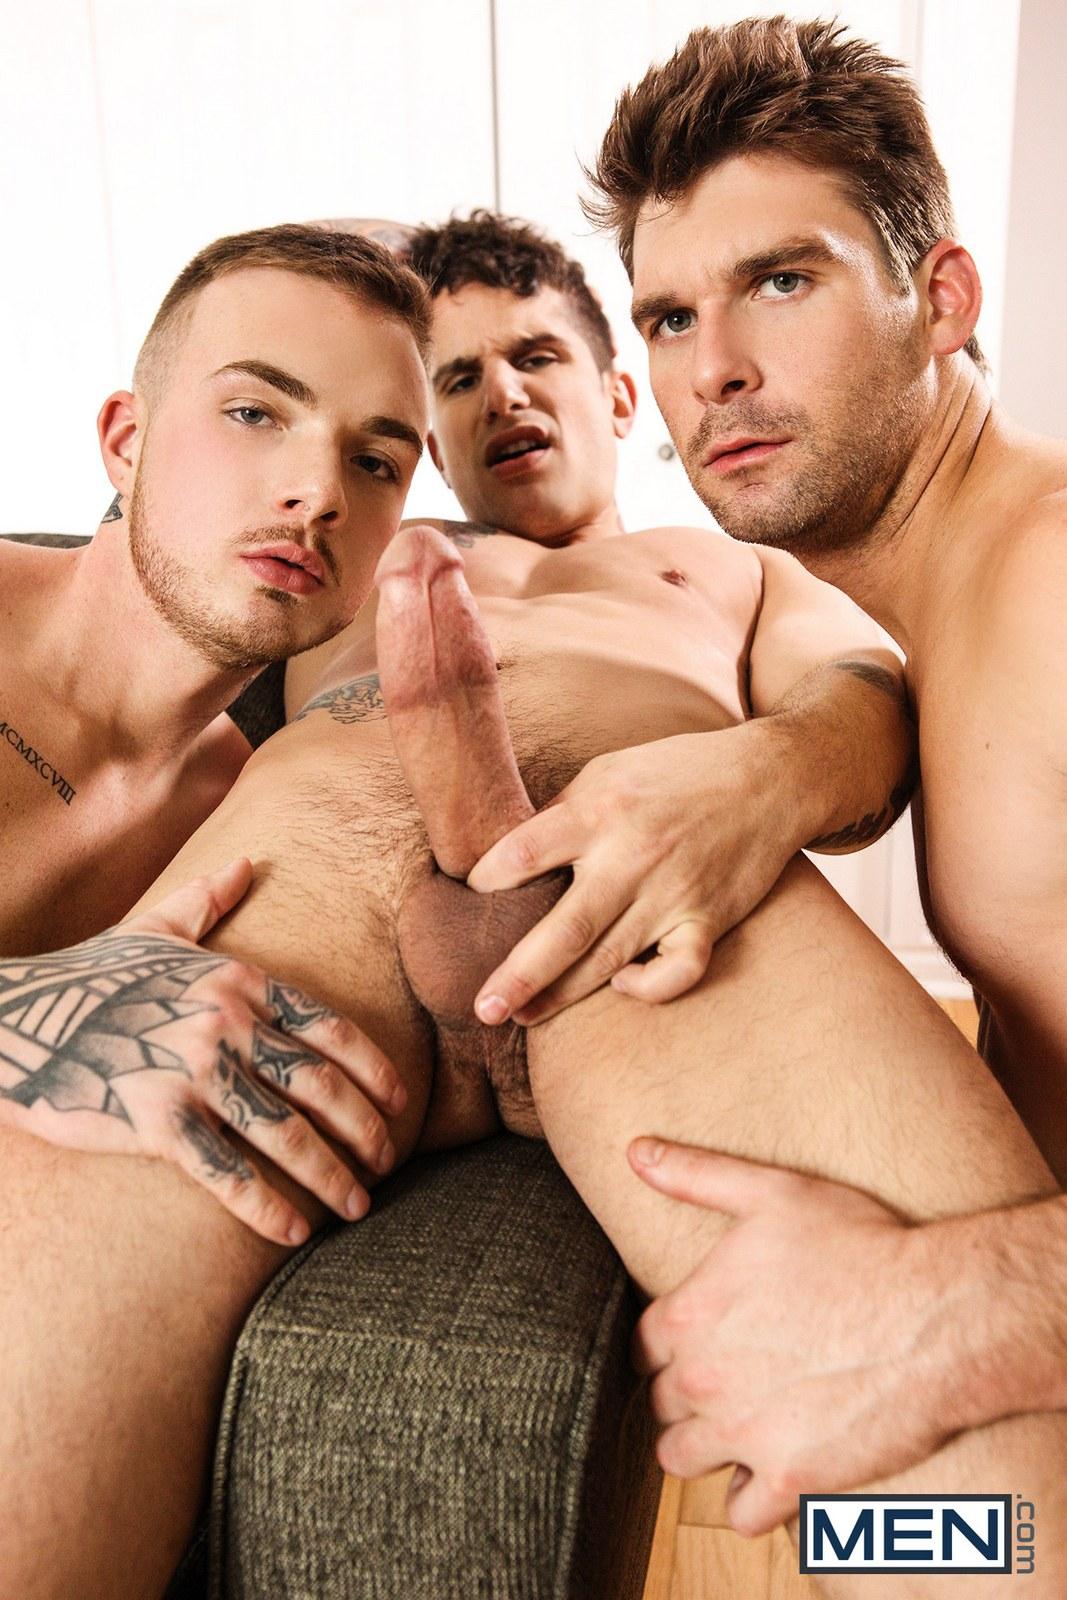 Gay porn stars having a threesome